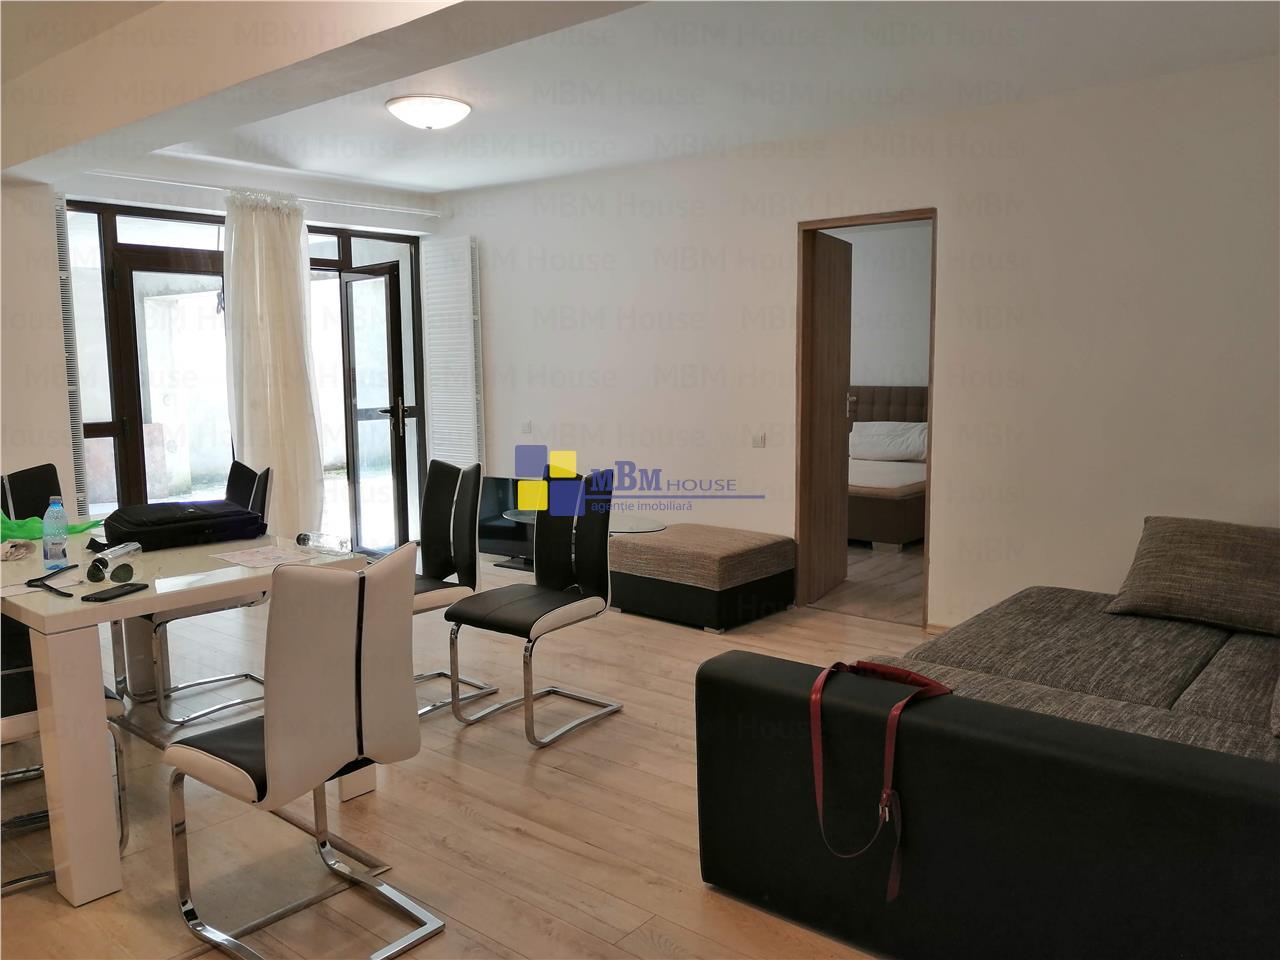 Apartament in vila, 120 mp, Cartier Noua